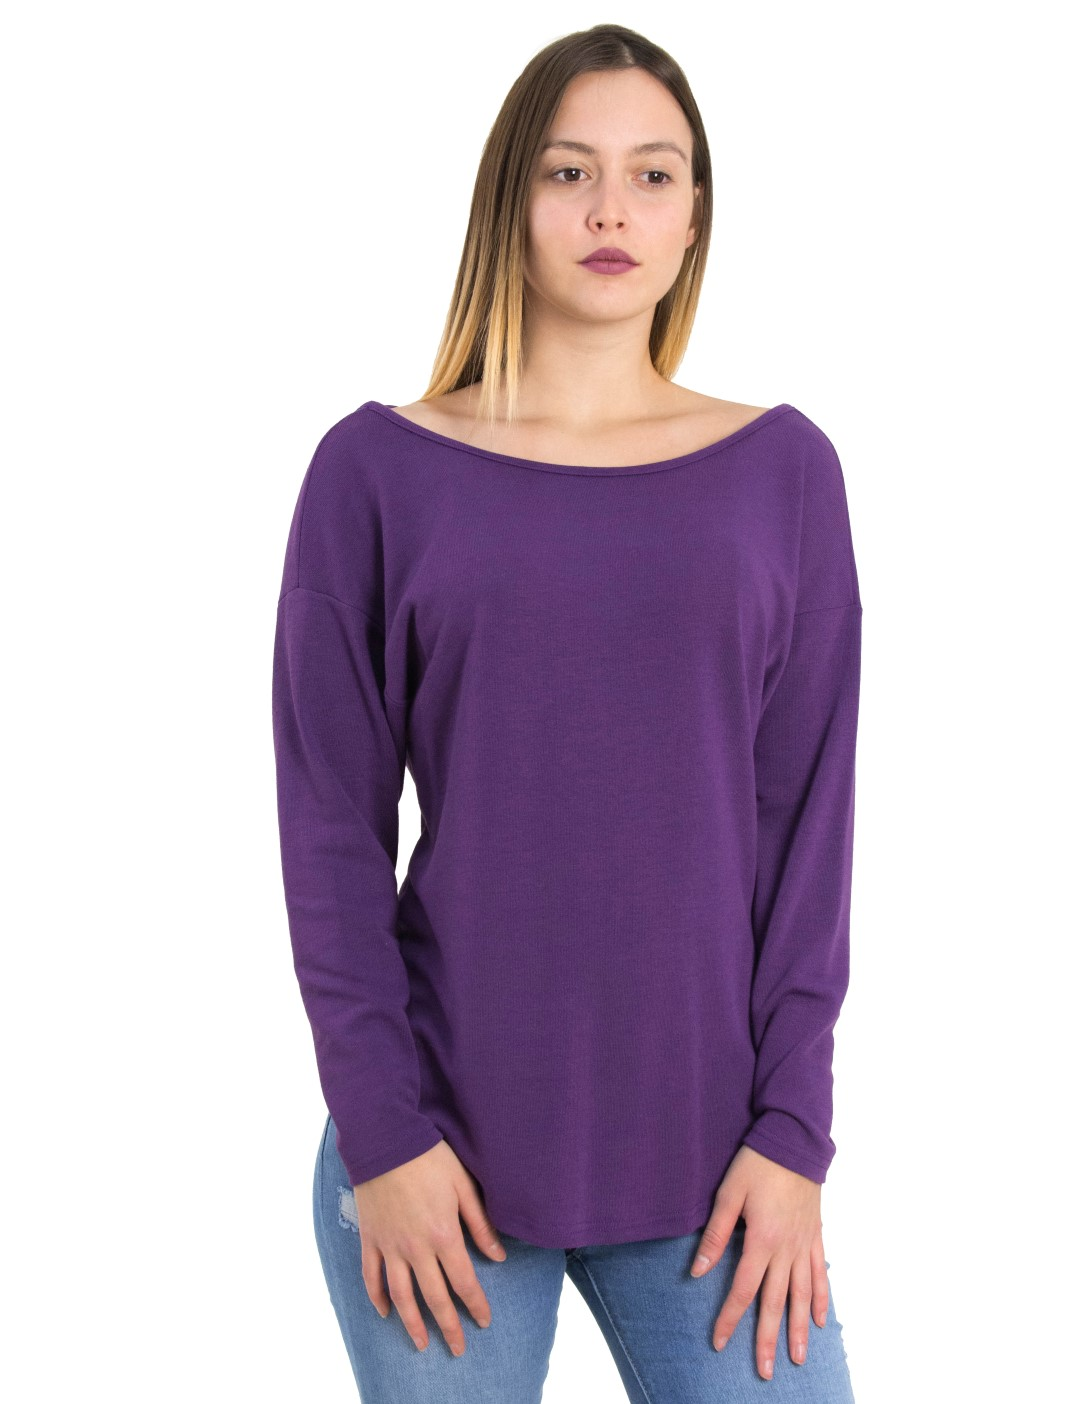 b1fdcb331da7 Γυναικεία μωβ μπλούζα χιαστί πλάτη Cocktail 014101032L - Glami.gr